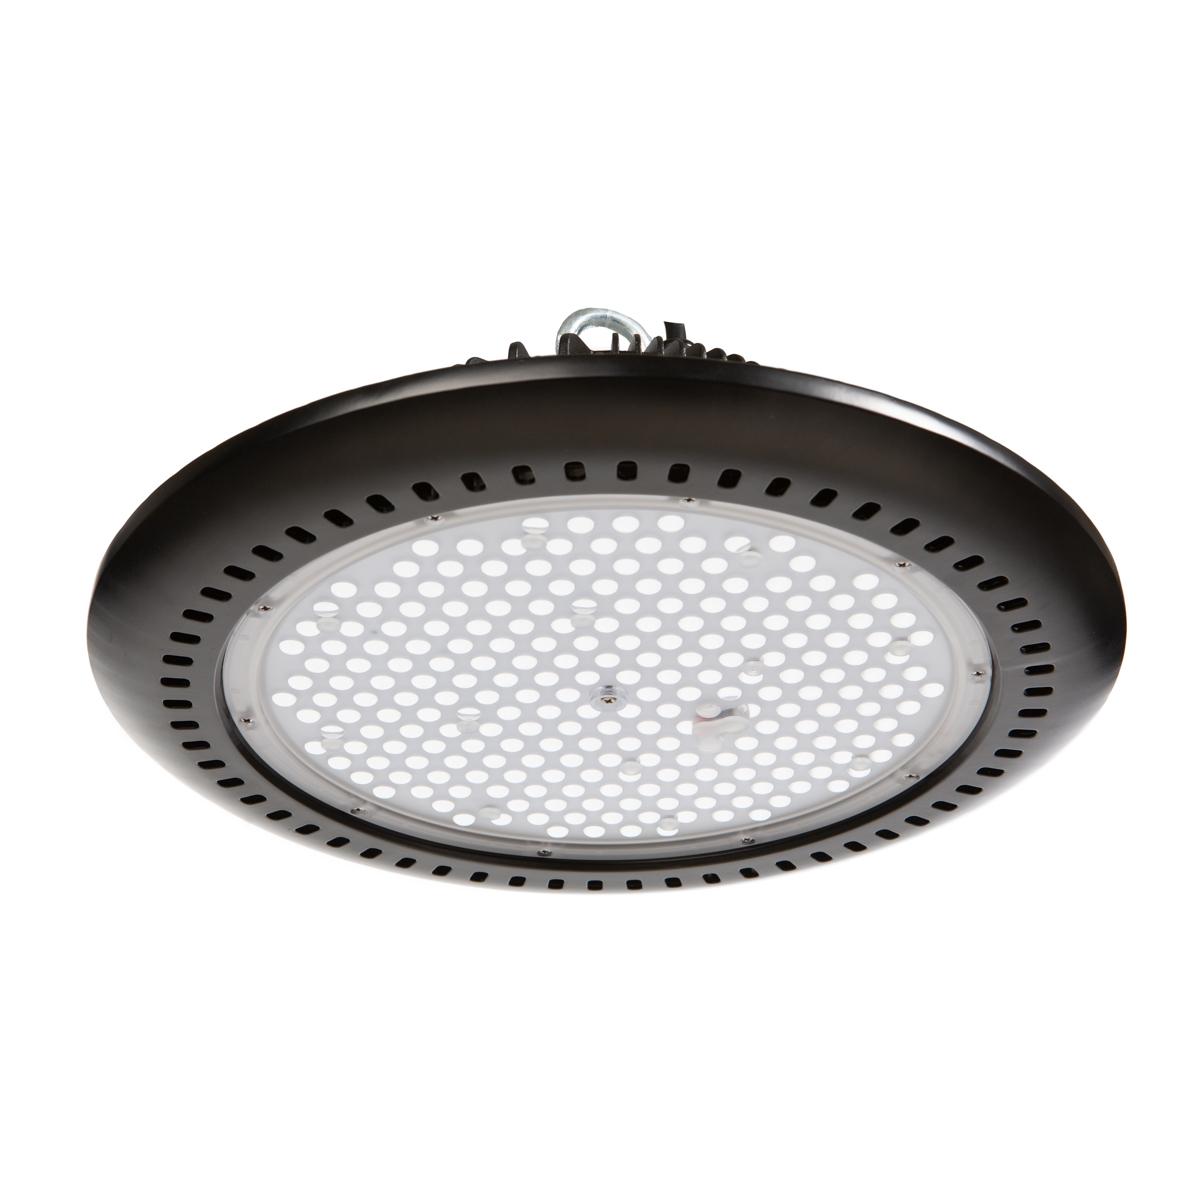 "MUVA LED – LED Hallenbeleuchtung ""Ufo"" - MUVA Tech GmbH"